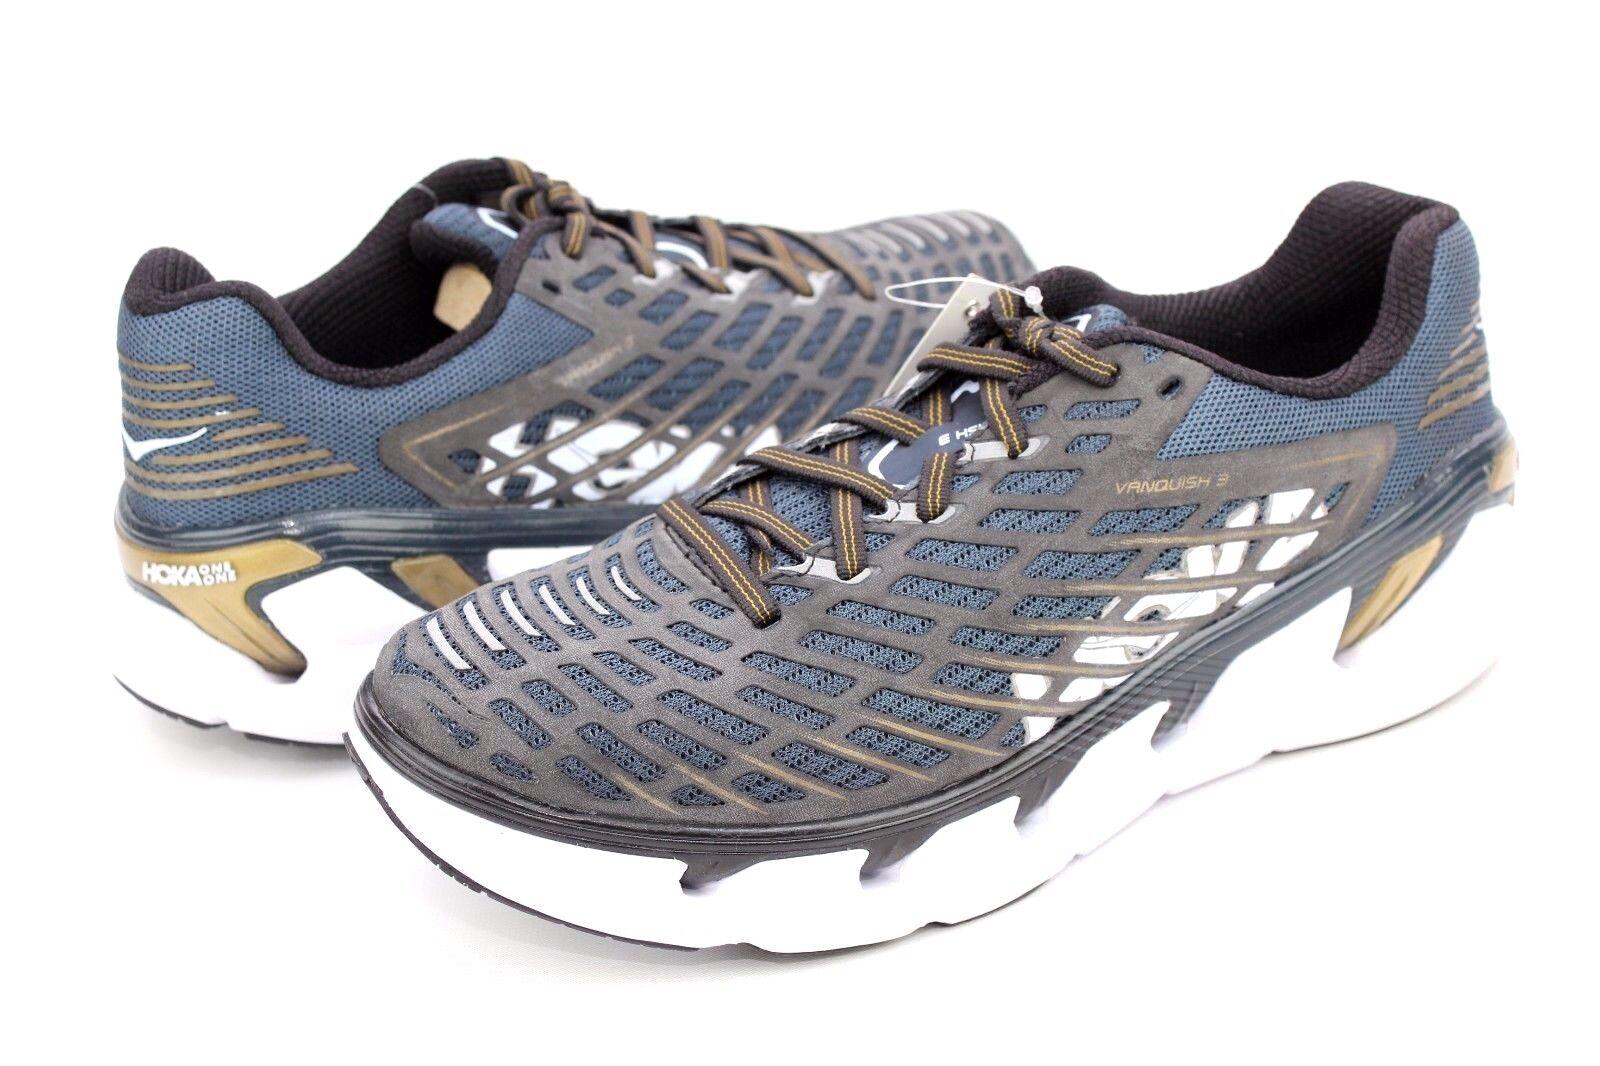 Hoka Vanquish 3 Para hombres Zapatos para Correr EE. UU. Color  Azul Oscuro Dorado Metálico